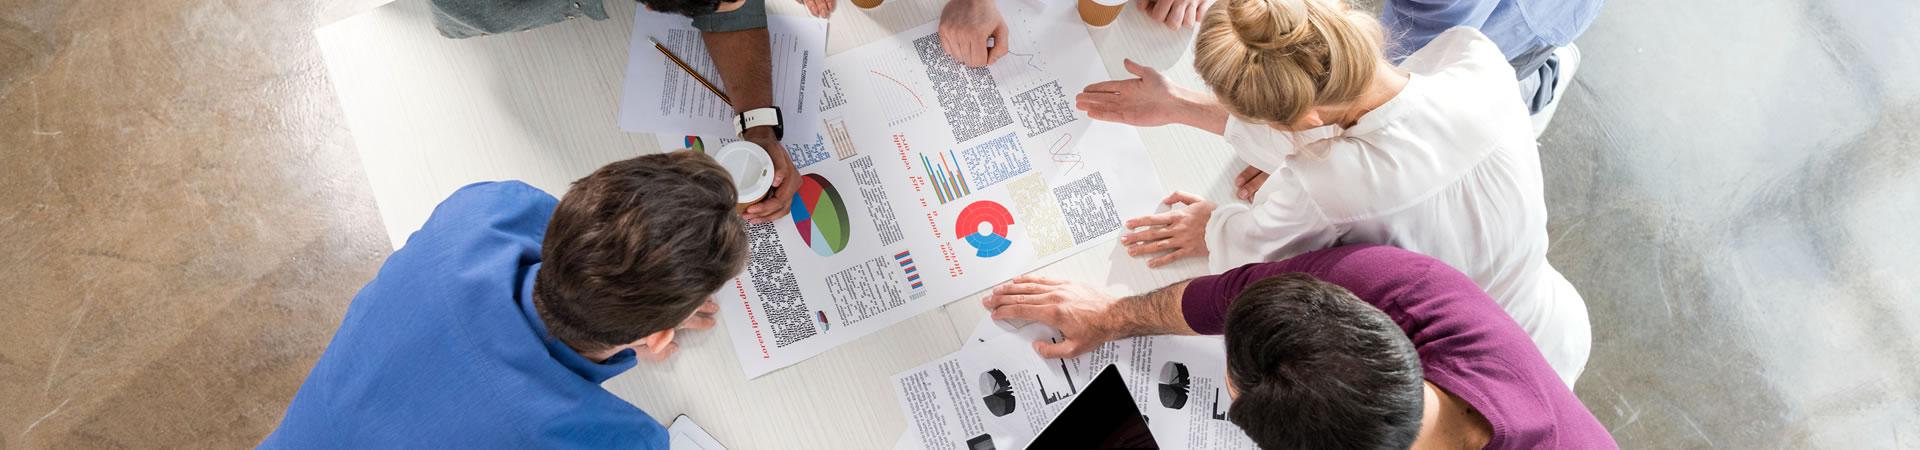 Majors Accountants in Hull Team Header